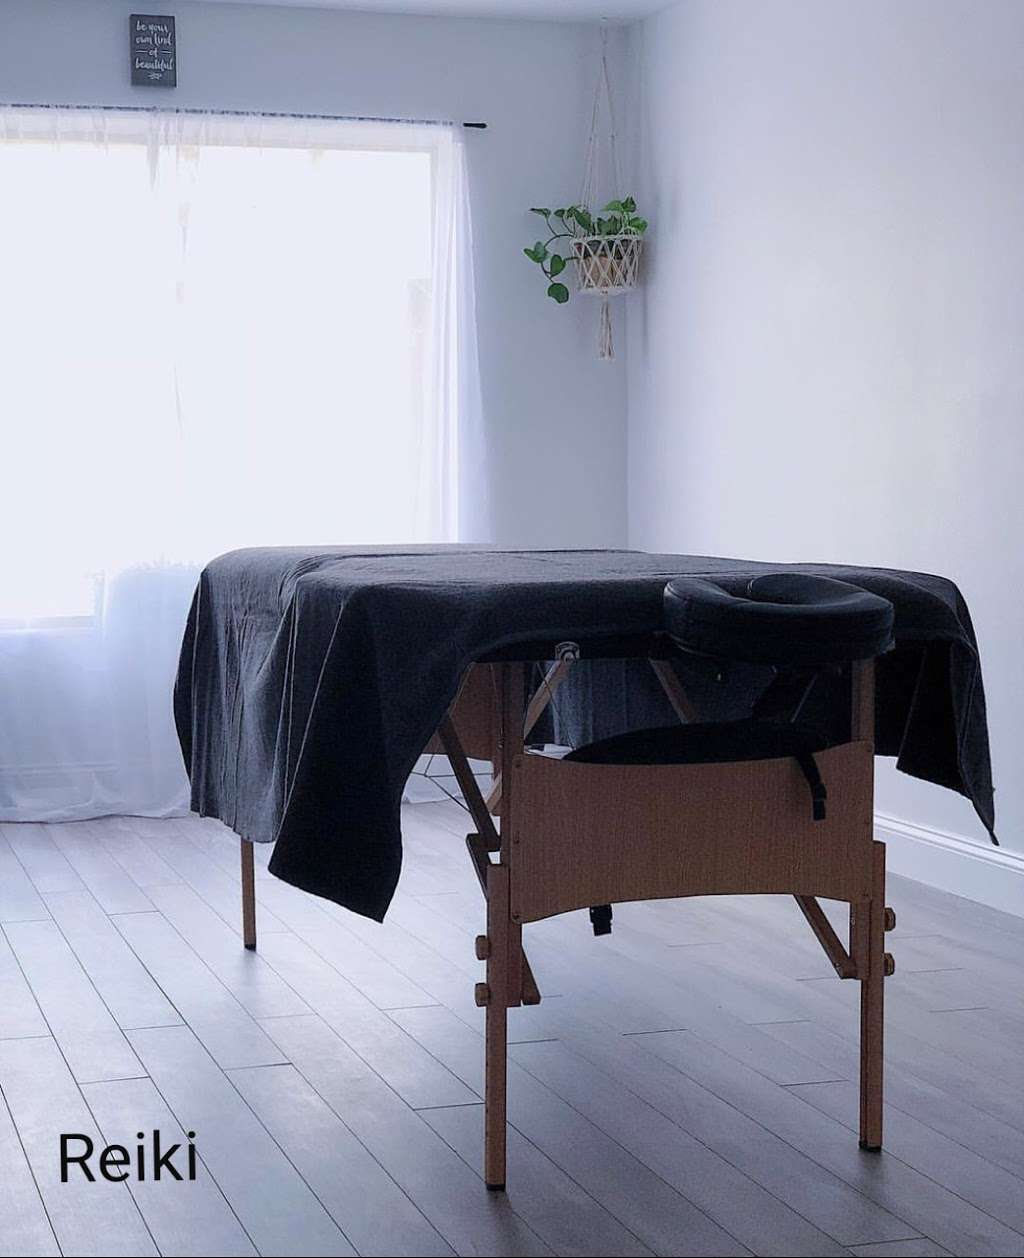 Nkisoy Yoga - gym  | Photo 10 of 10 | Address: 2000 Bigler St 2nd floor, Fort Lee, NJ 07024, USA | Phone: (856) 373-8612